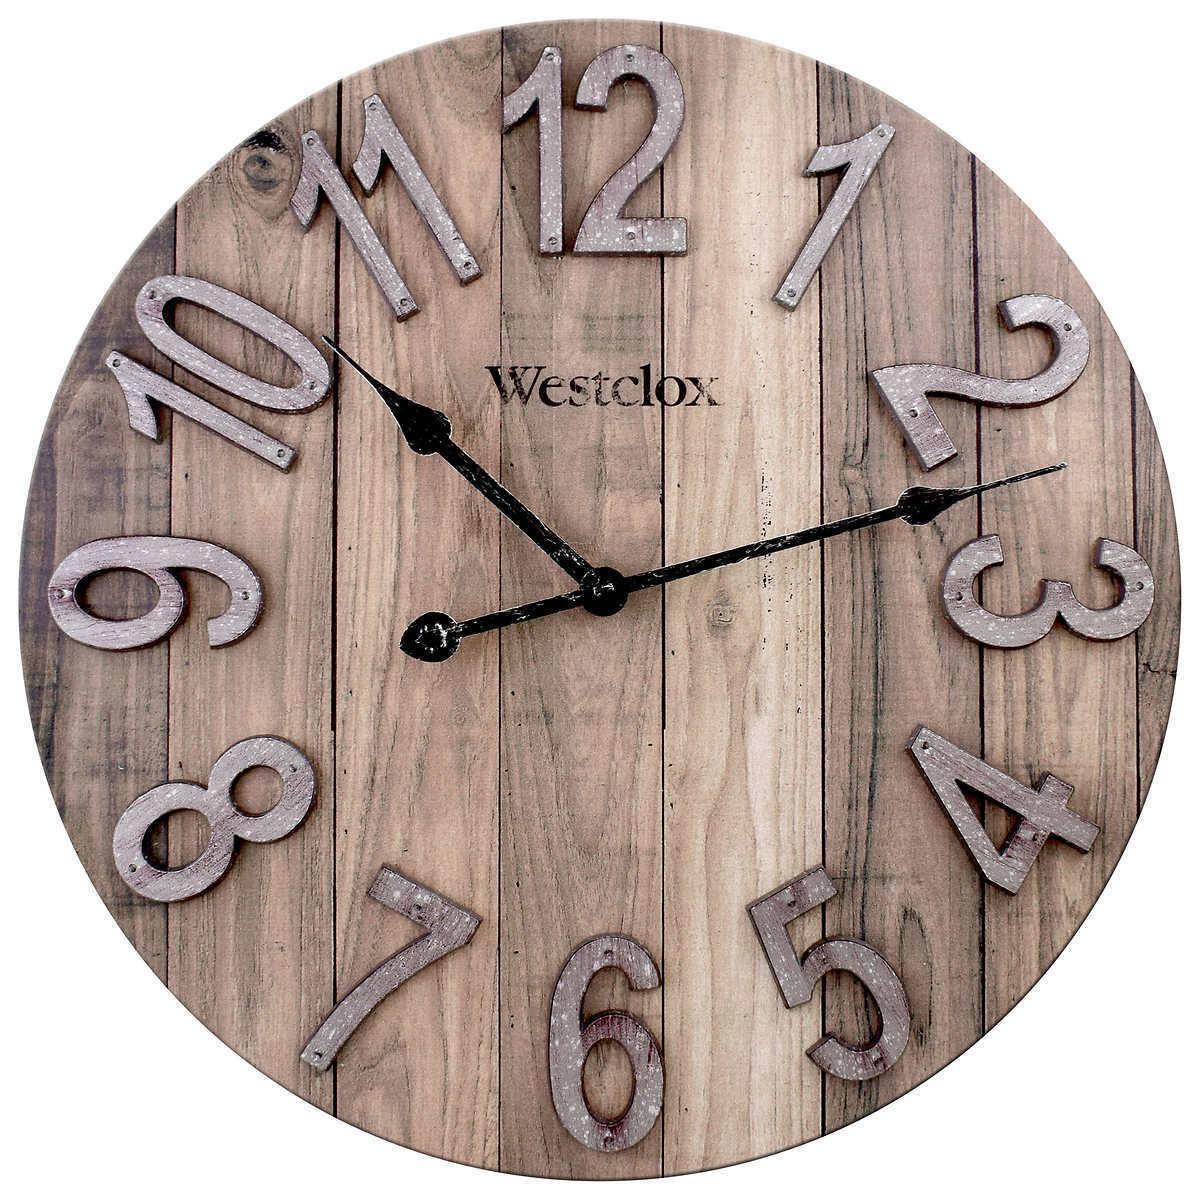 East Urban Home Designart Wooden Walls And Windows Farmhouse Wall Clock For Sale Online Ebay